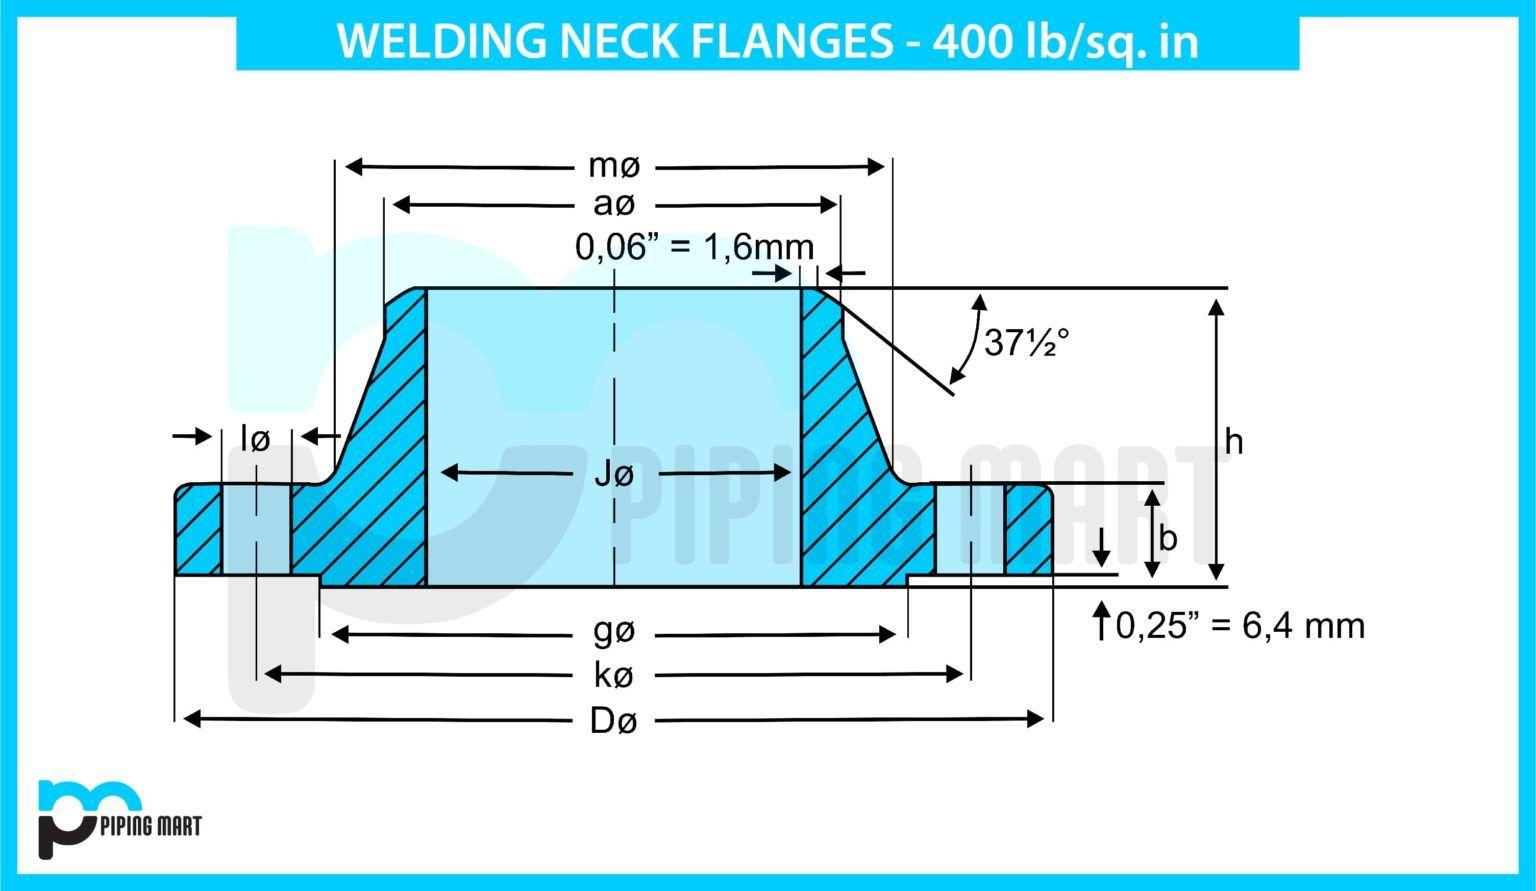 B16 5 Welding Neck Flanges Dimensions 400 Lbs In 2020 Dimensions Welding Floor Plans